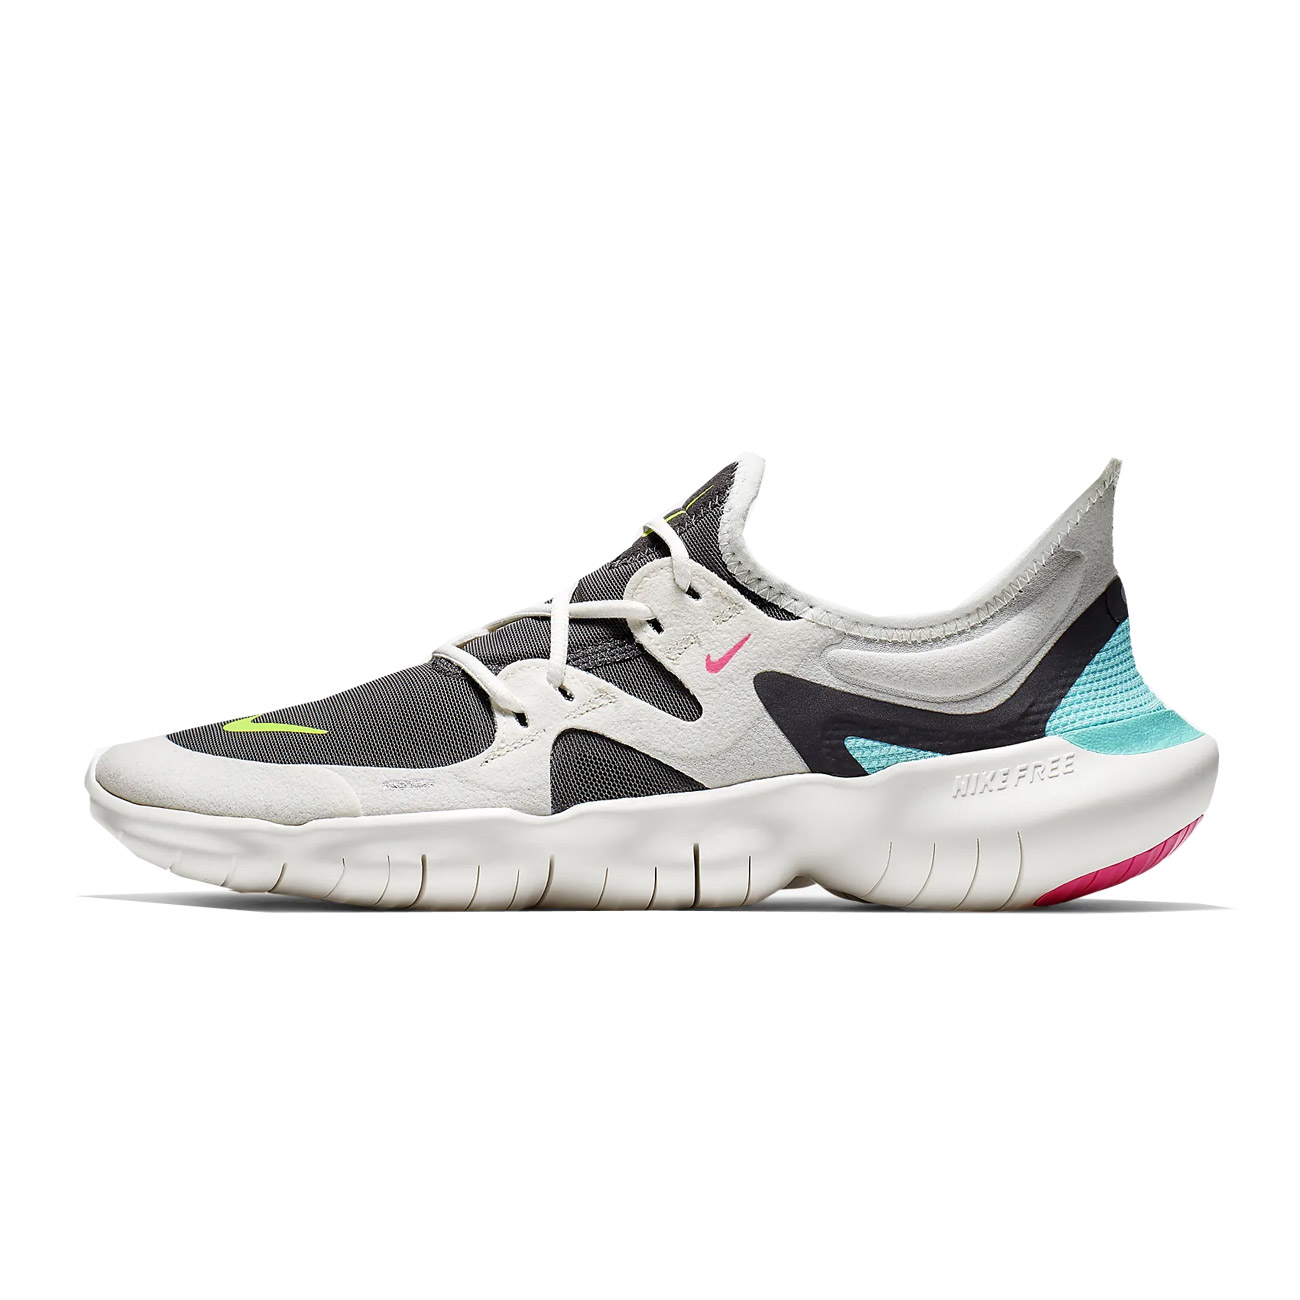 30d935111b21 Nike Women s Free RN 5.0 Running Shoe - Sail Volt Thunder